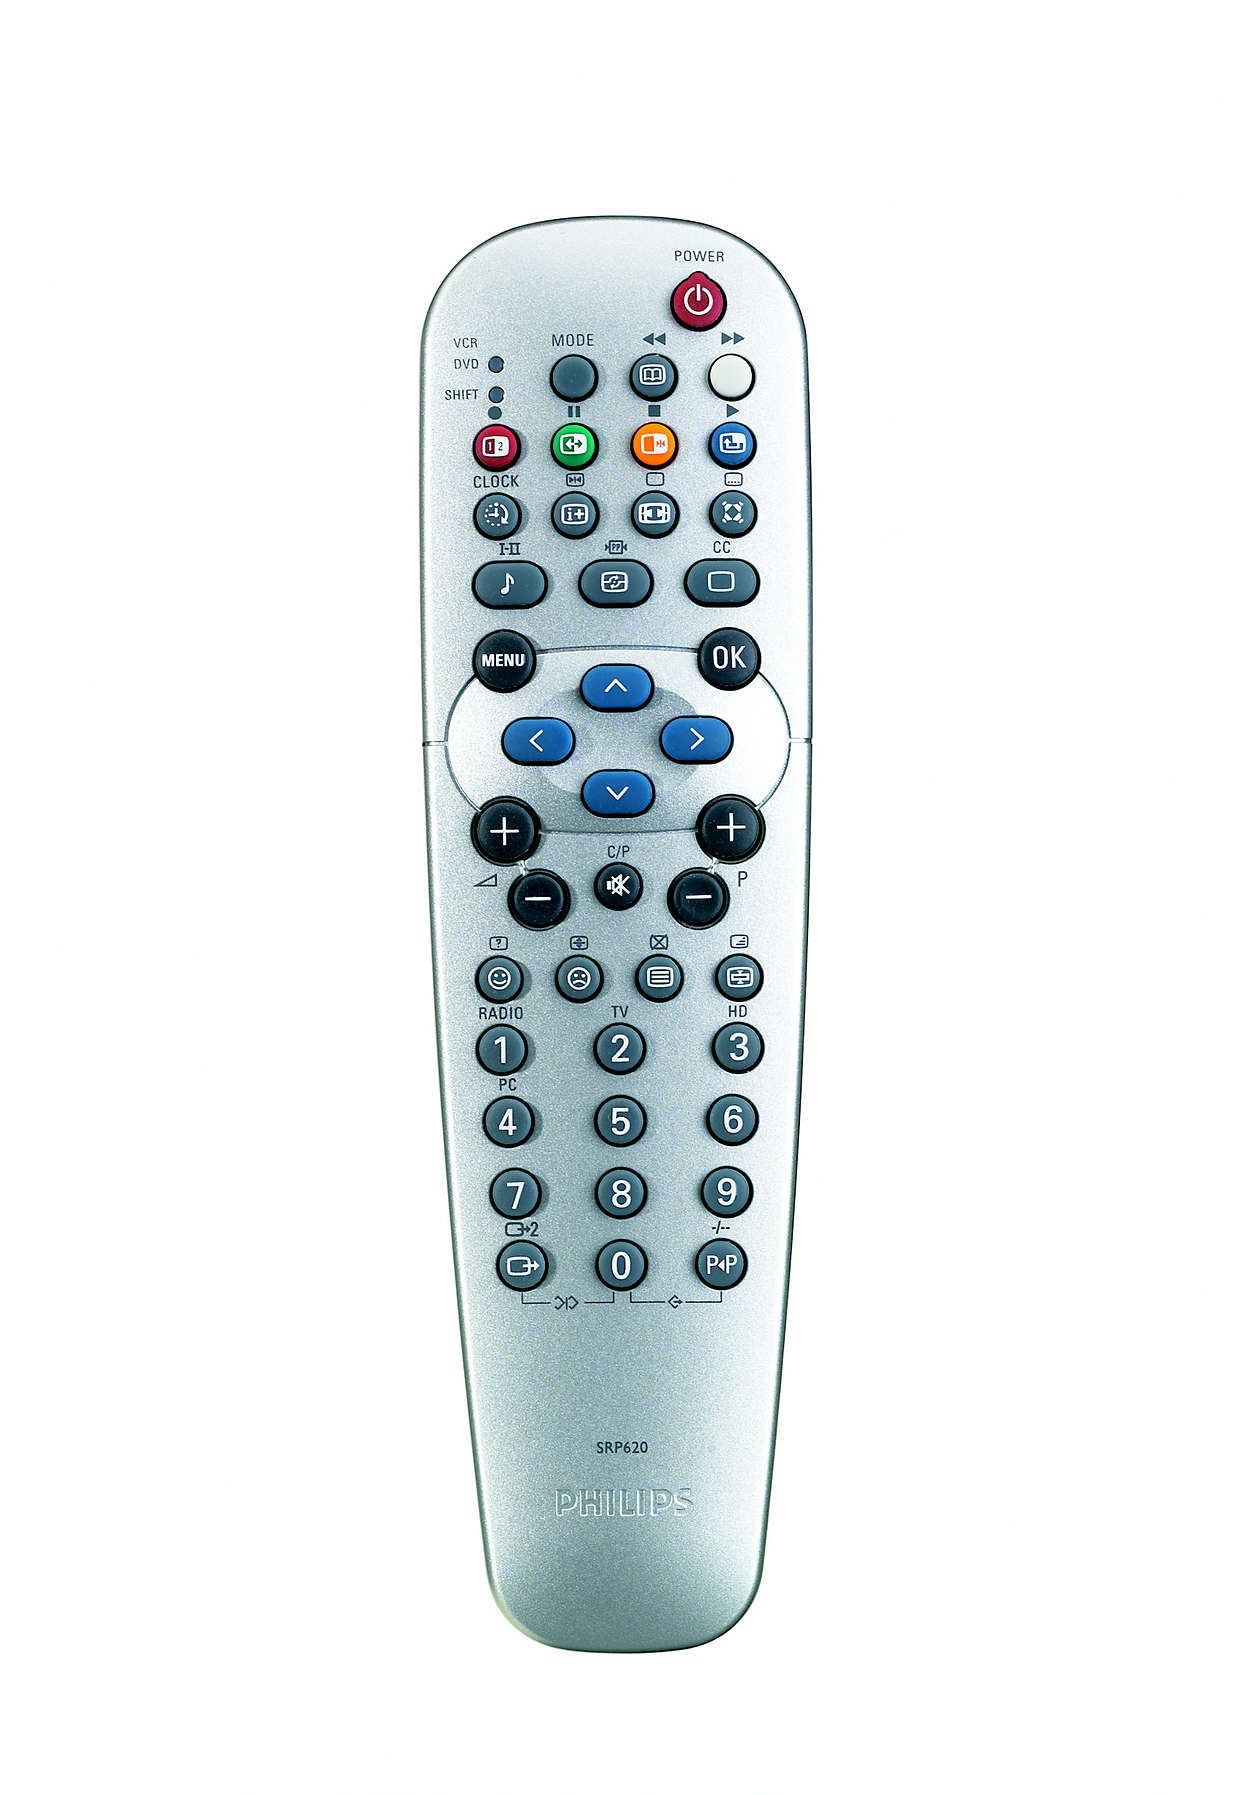 Ger dig tillbaka kontrollen över din TV